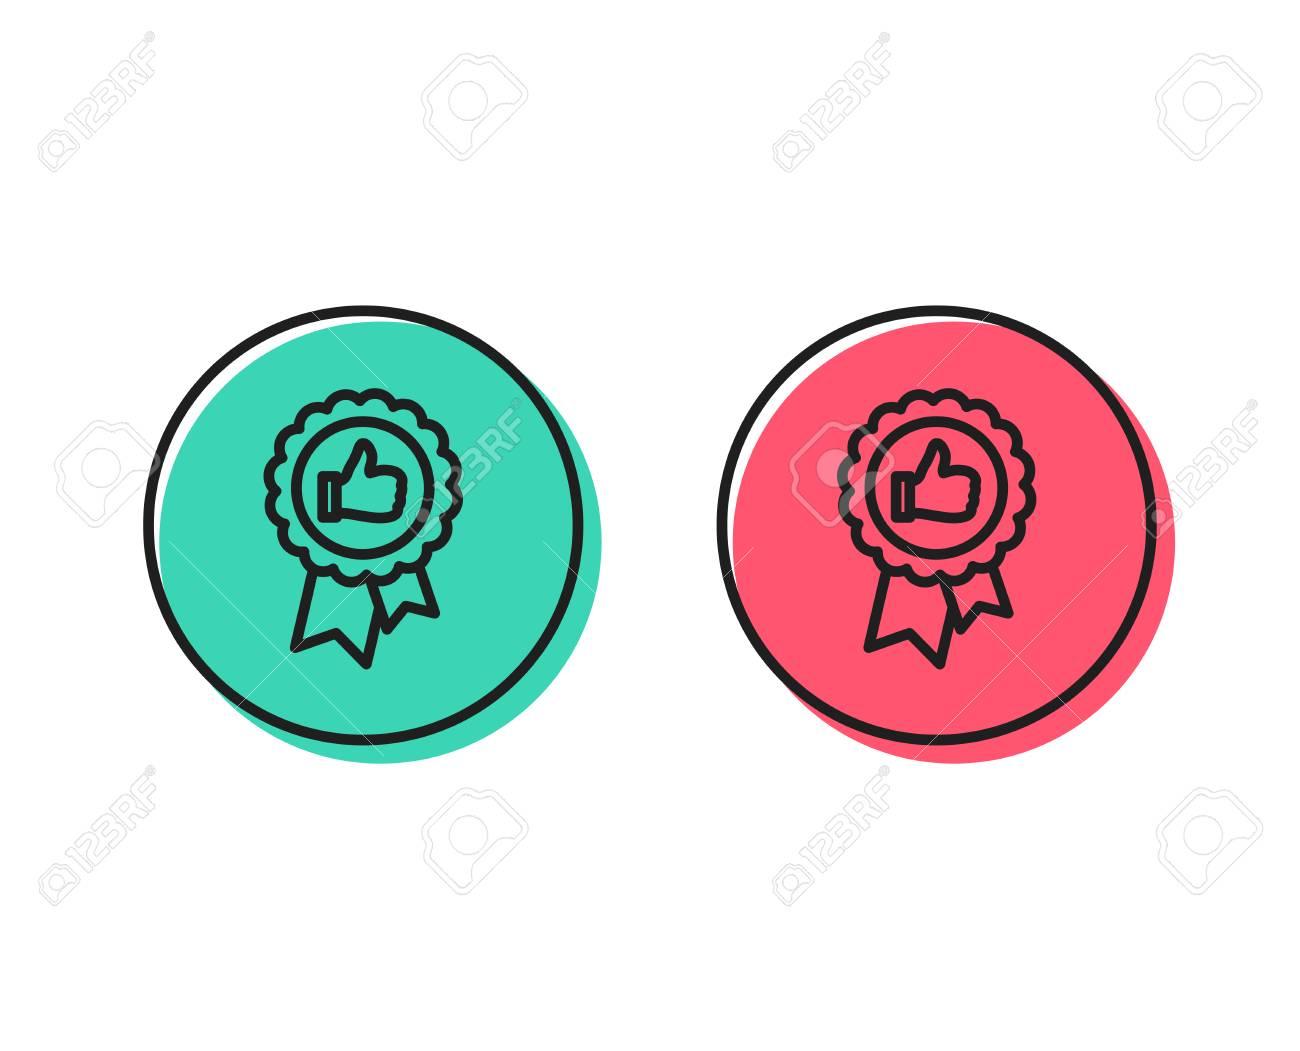 Positive feedback line icon. Award medal symbol. Reward sign. Positive and negative circle buttons concept. Good or bad symbols. Positive feedback Vector - 112886015